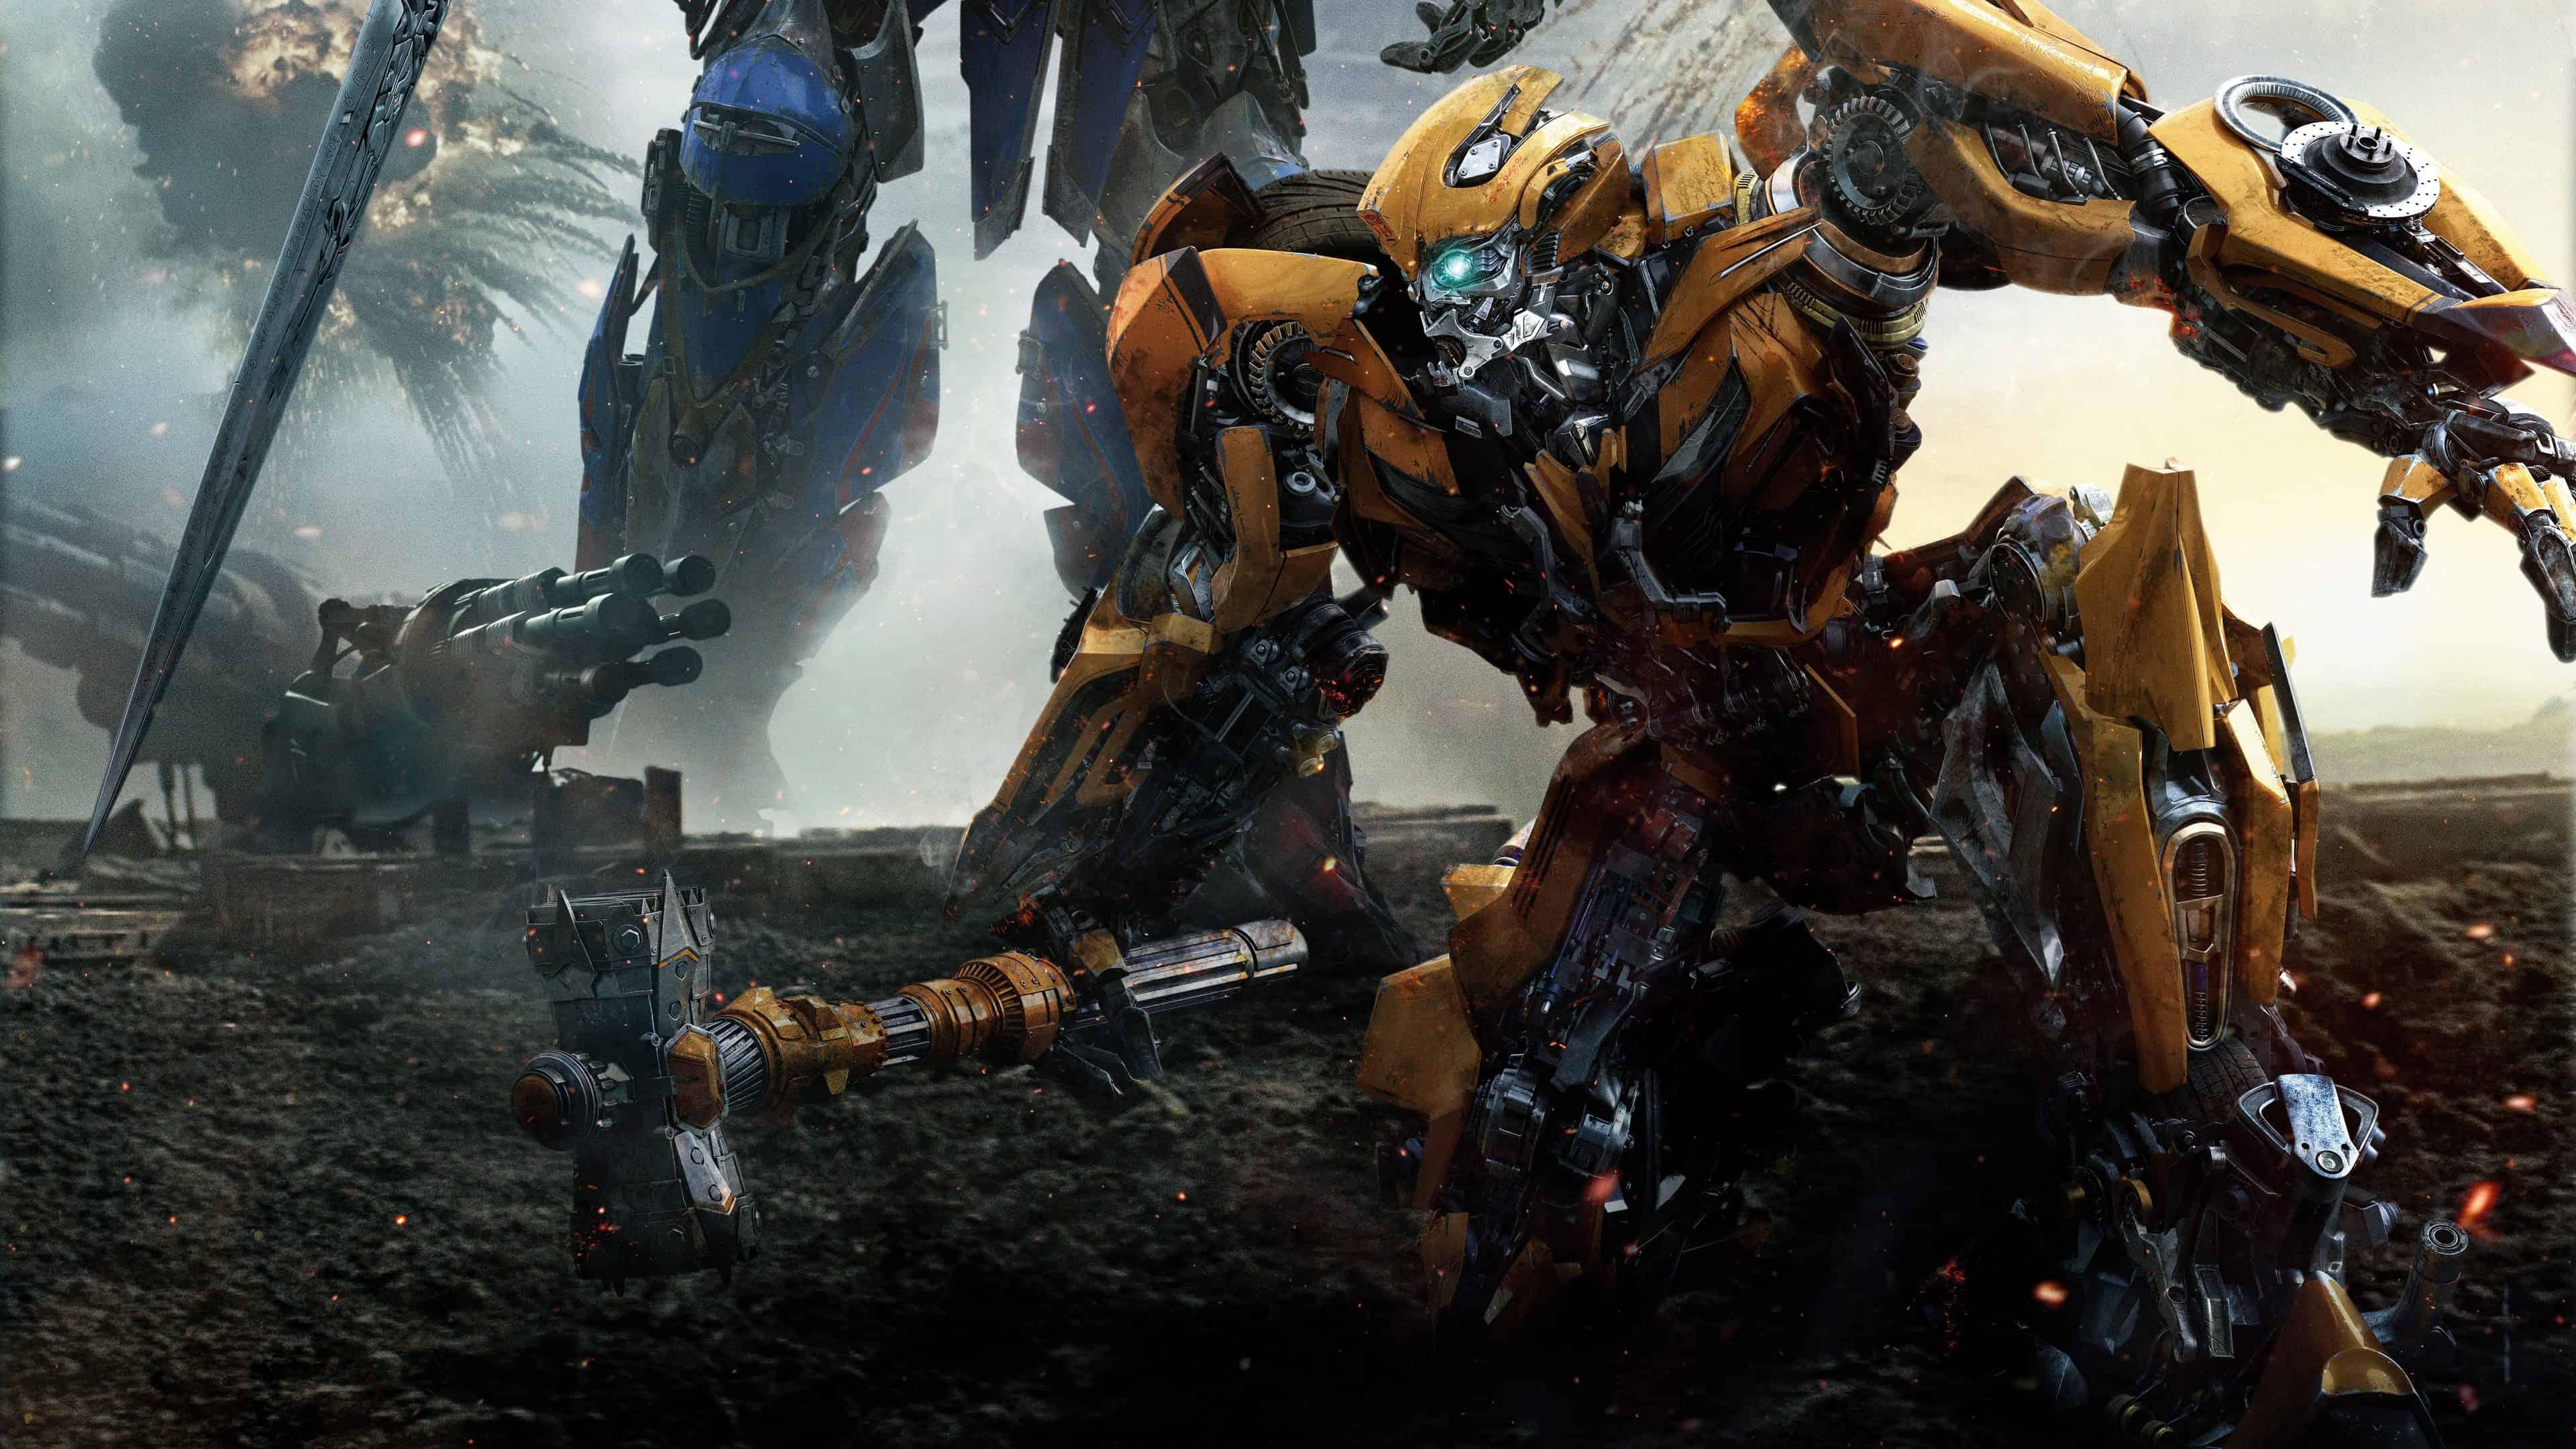 transformers 4k download free